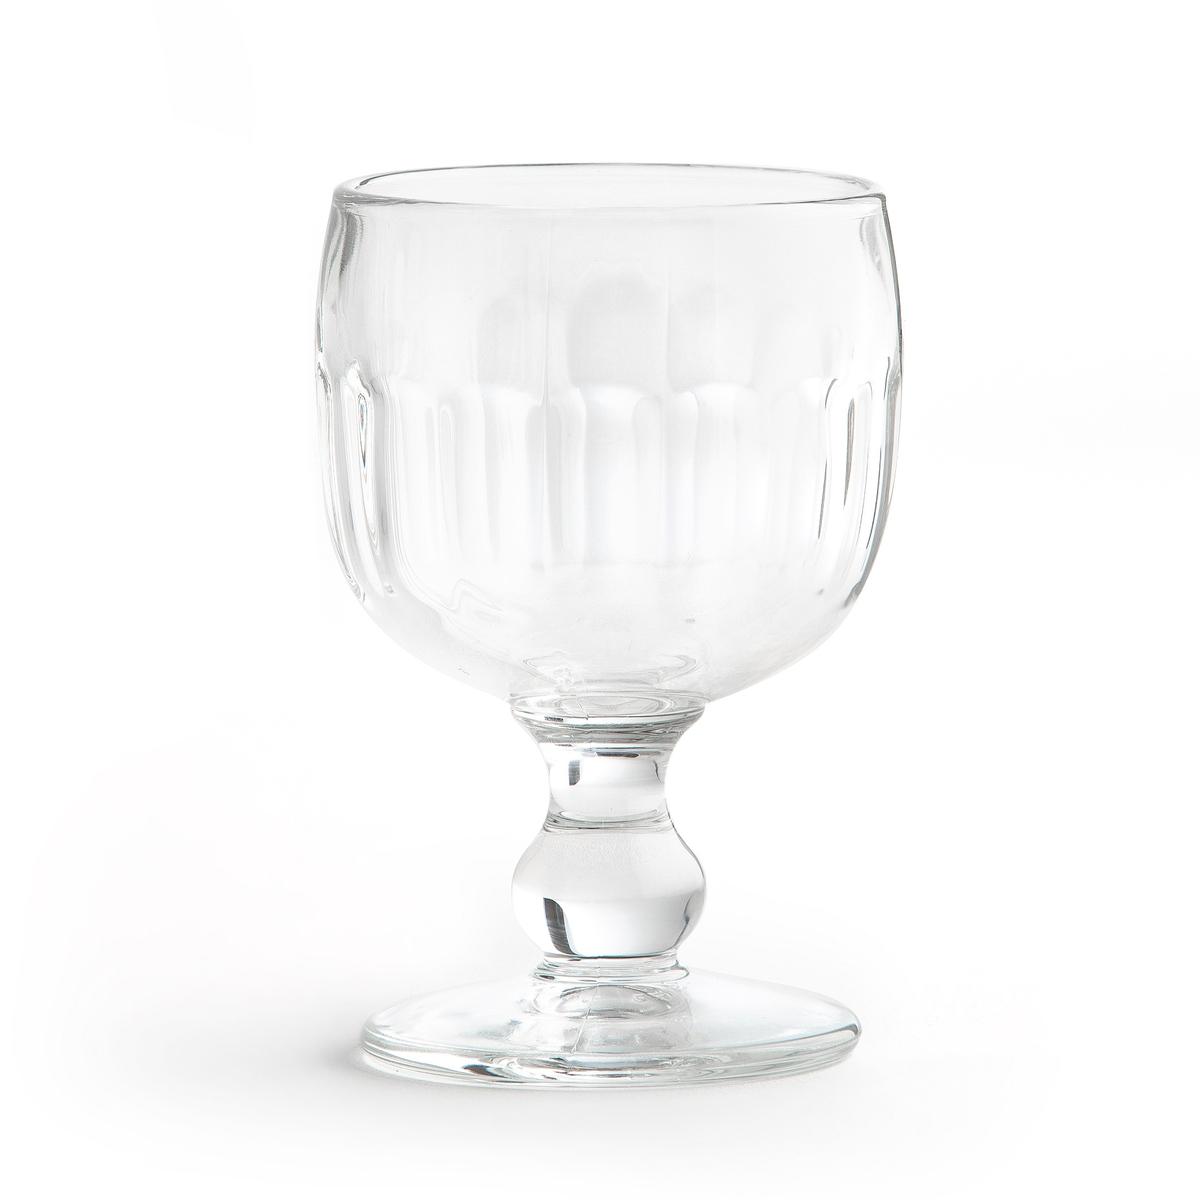 Alchyse Set of 6 Wine Glasses